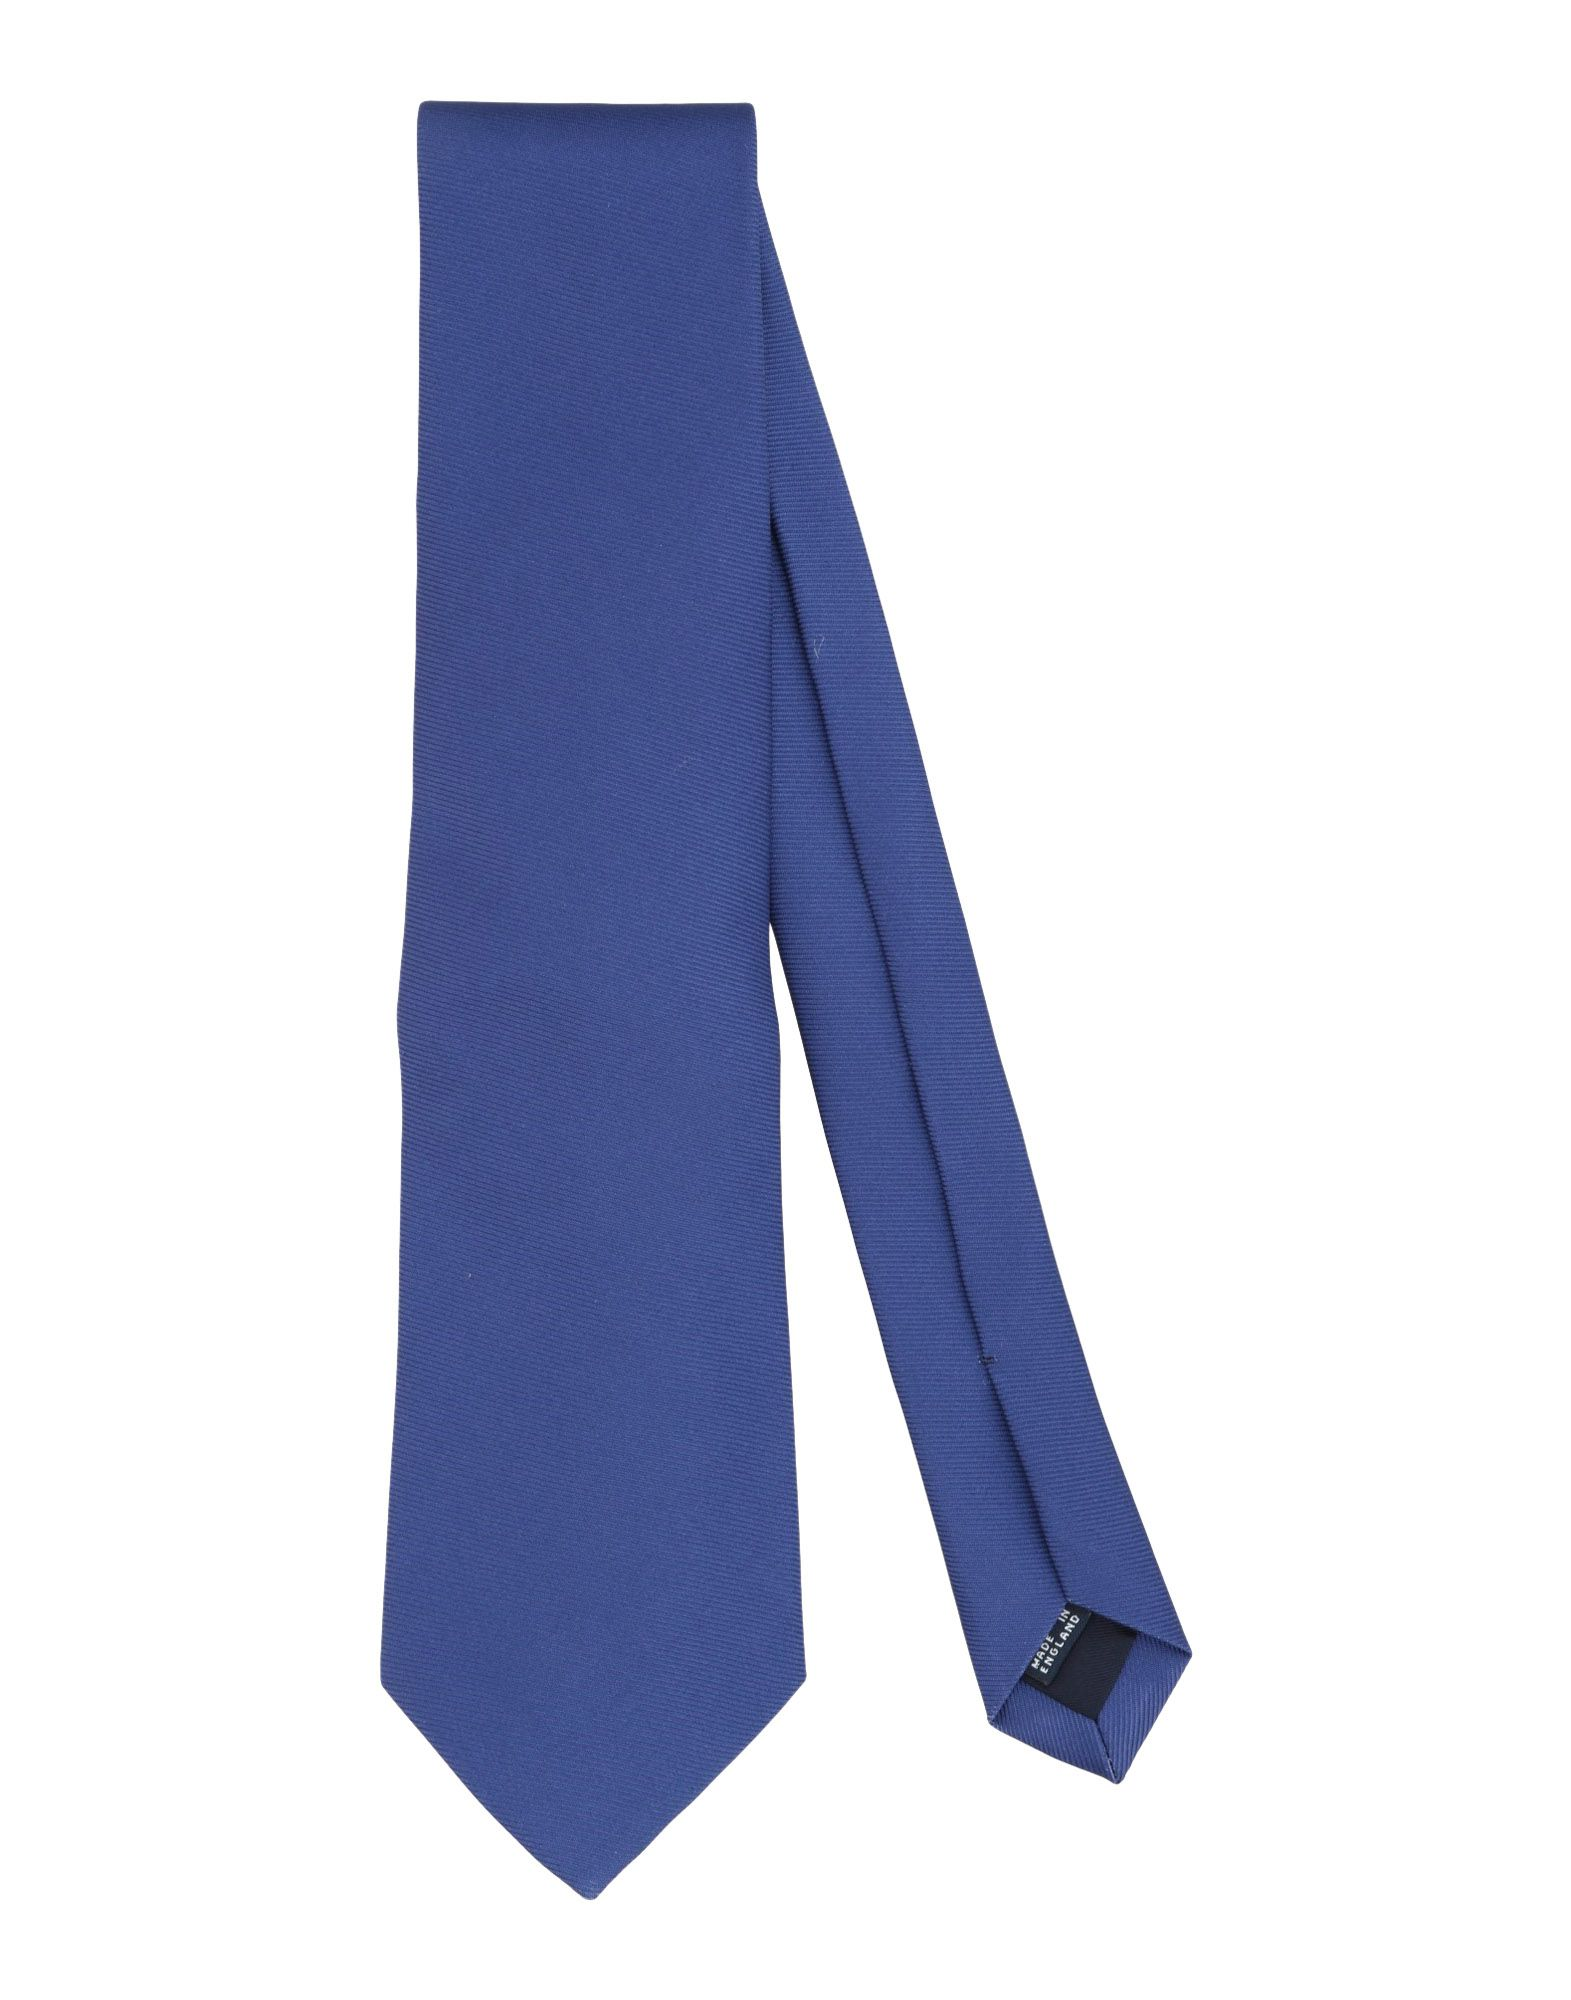 EMMA WILLIS Tie in Blue